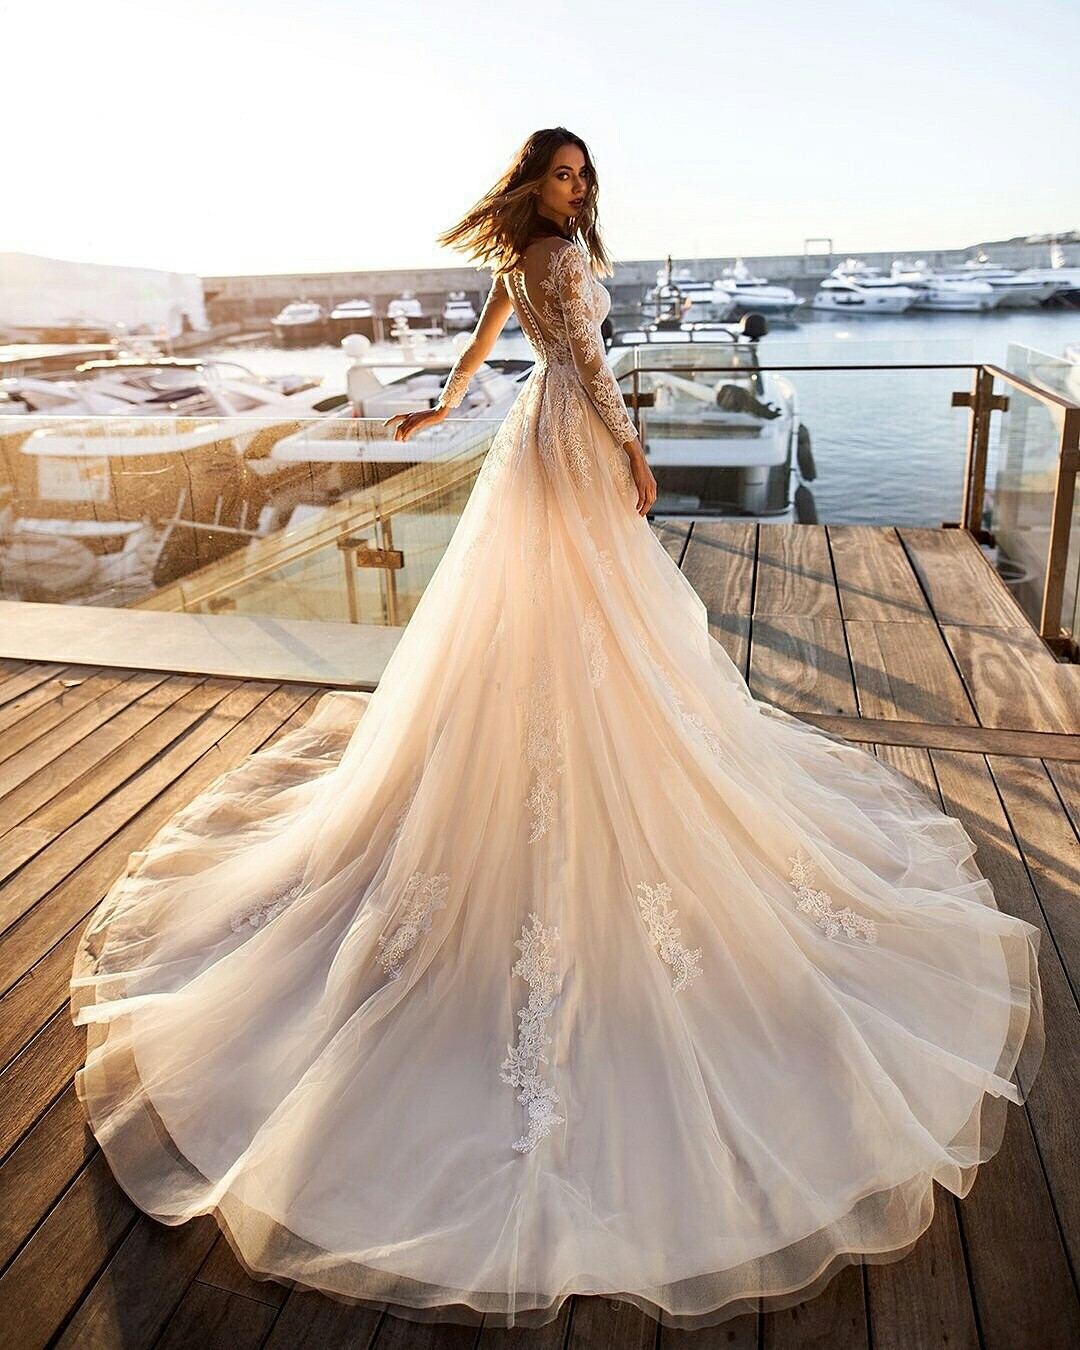 #freetoedit #freetoedit #bride #brides #bridesmaidstyles #happy #wedding #weddingphotography #weddingdress #weddinginspiration #beautifulday #happybride